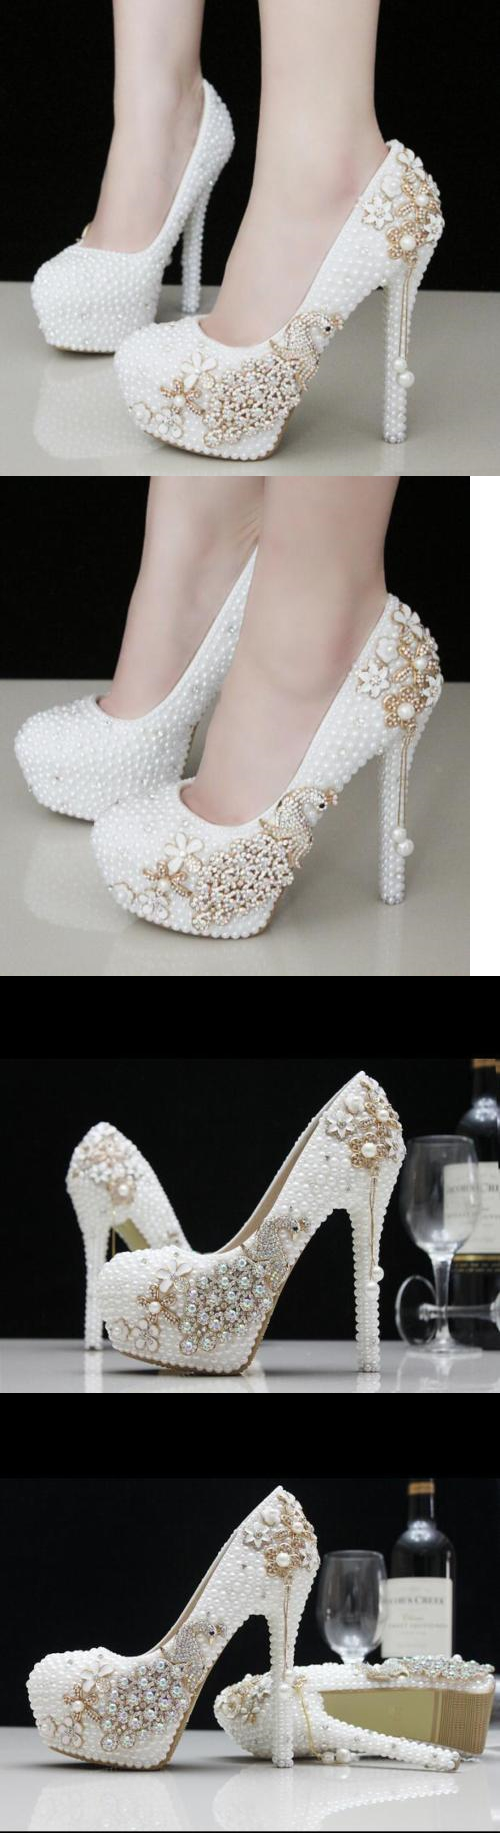 Wedding Shoes And Bridal Womens White Pearls Crystal Platform High Heels